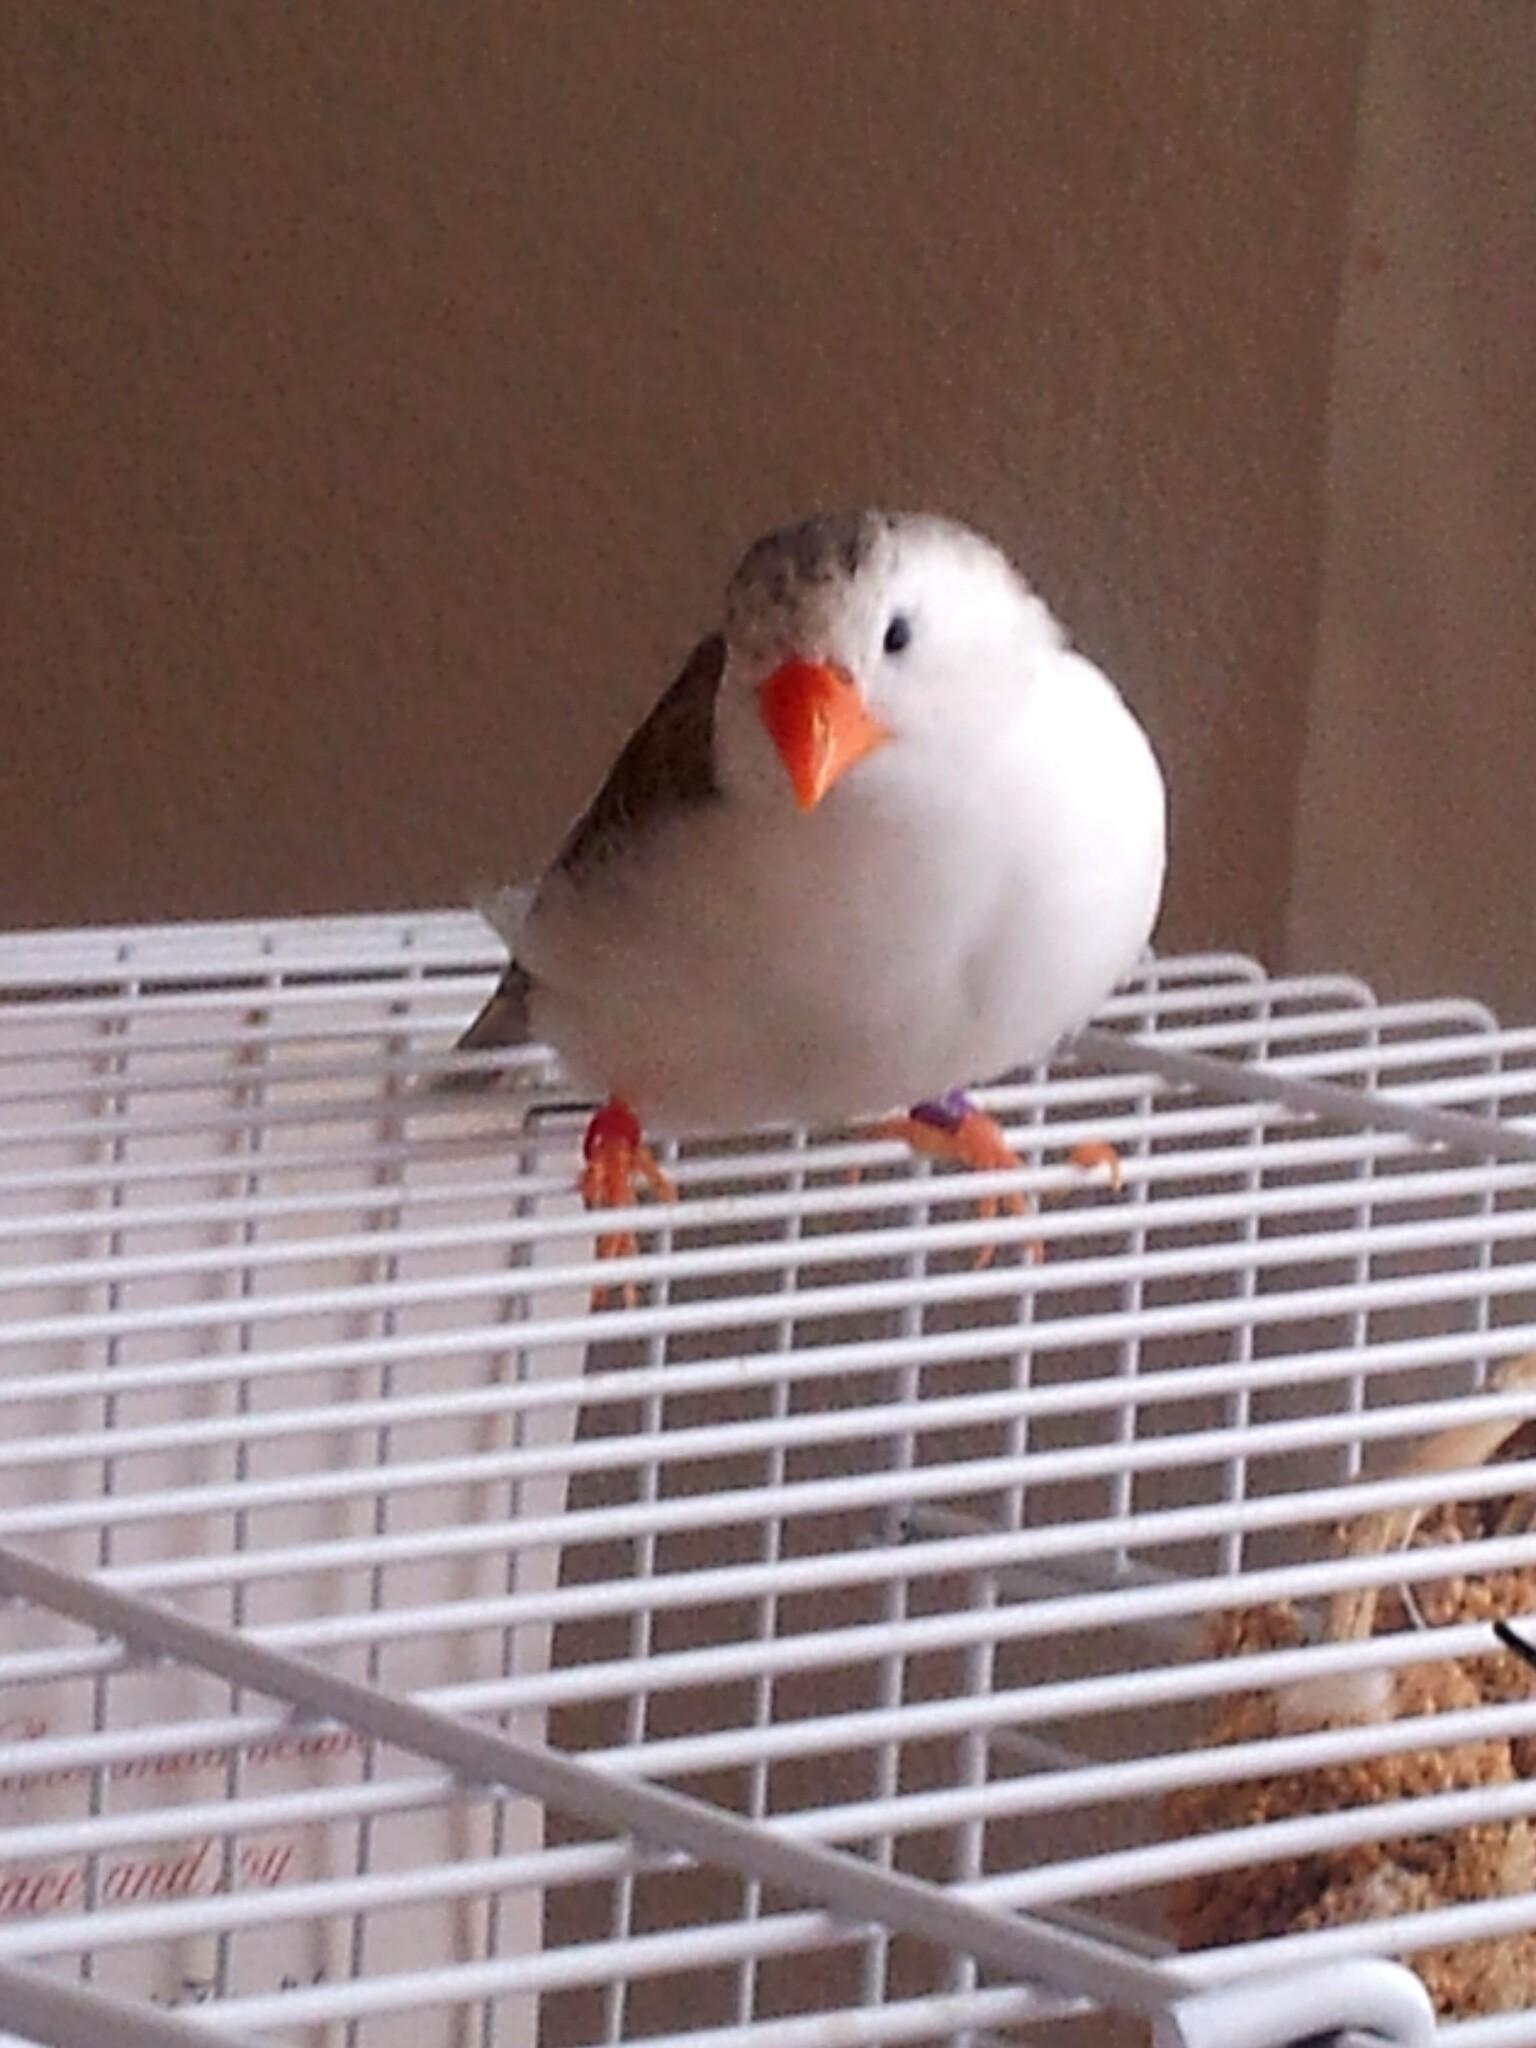 Finches For Sale Craigslist : finches, craigslist, Zebra, White, Finch, Aviary